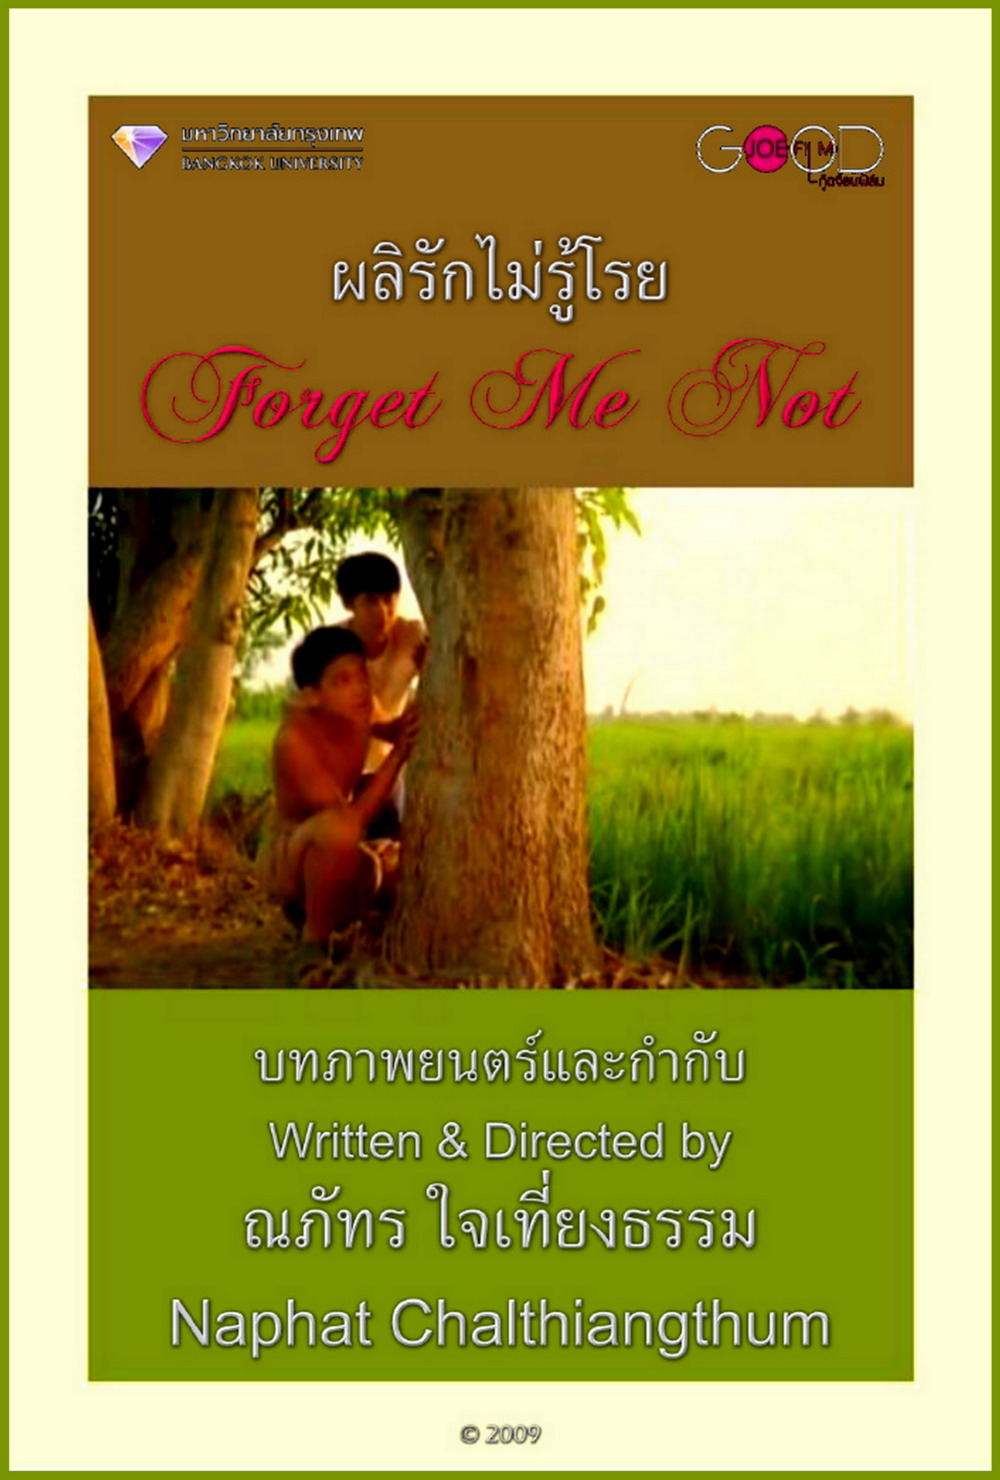 Forget Me Not (2009) ผลิรักไม่รู้โรย